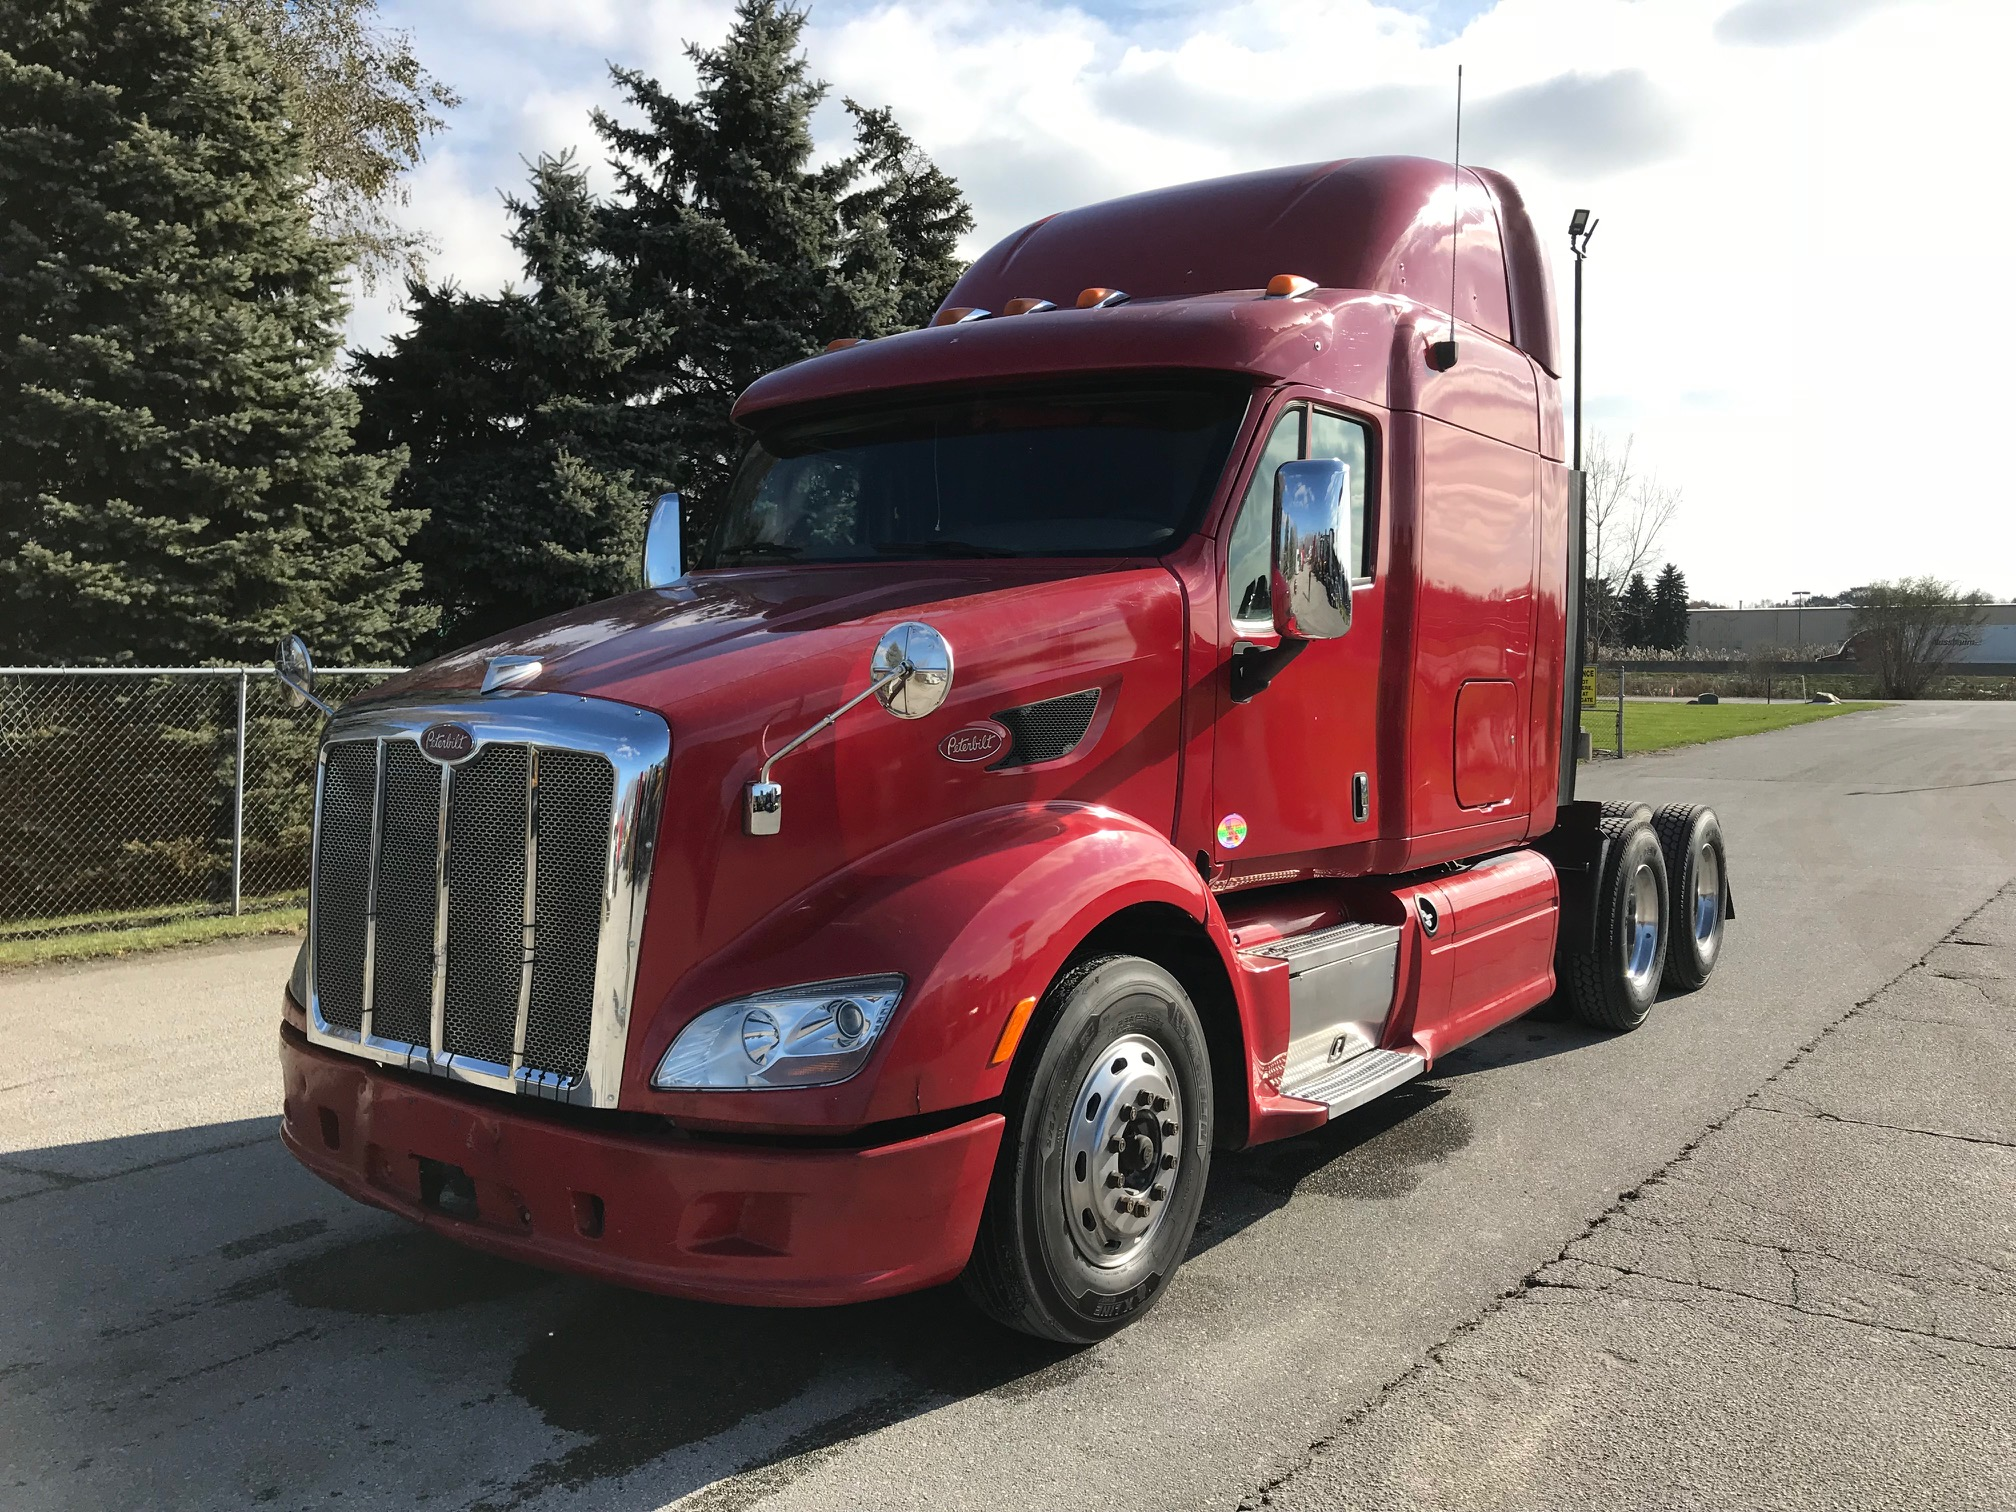 Peterbilt Trucks for Sale | Peterbilt 387 models | TLG